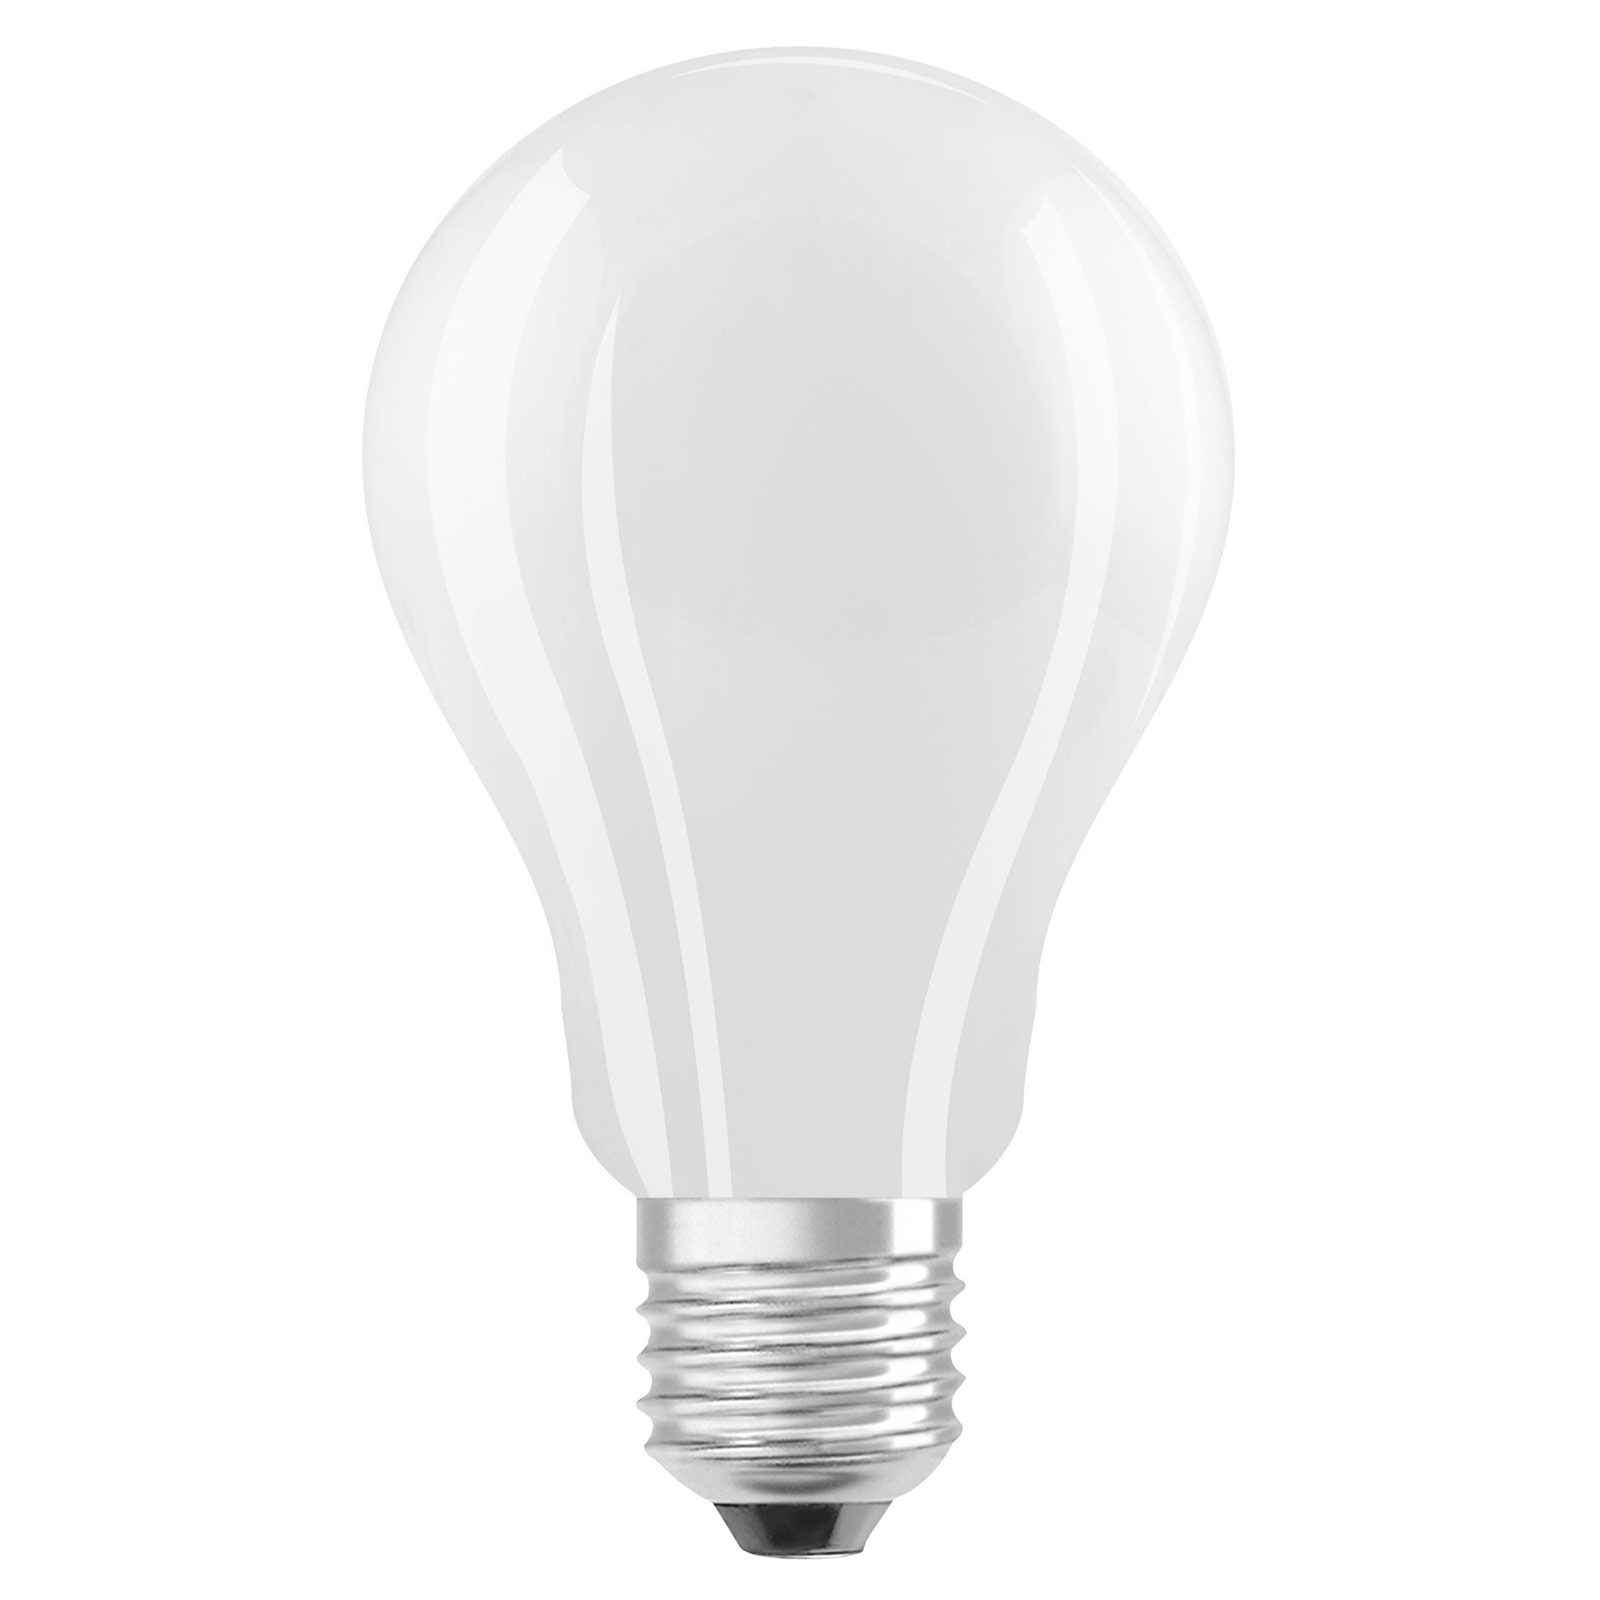 OSRAM ampoule LED E27 15W opale 4000K